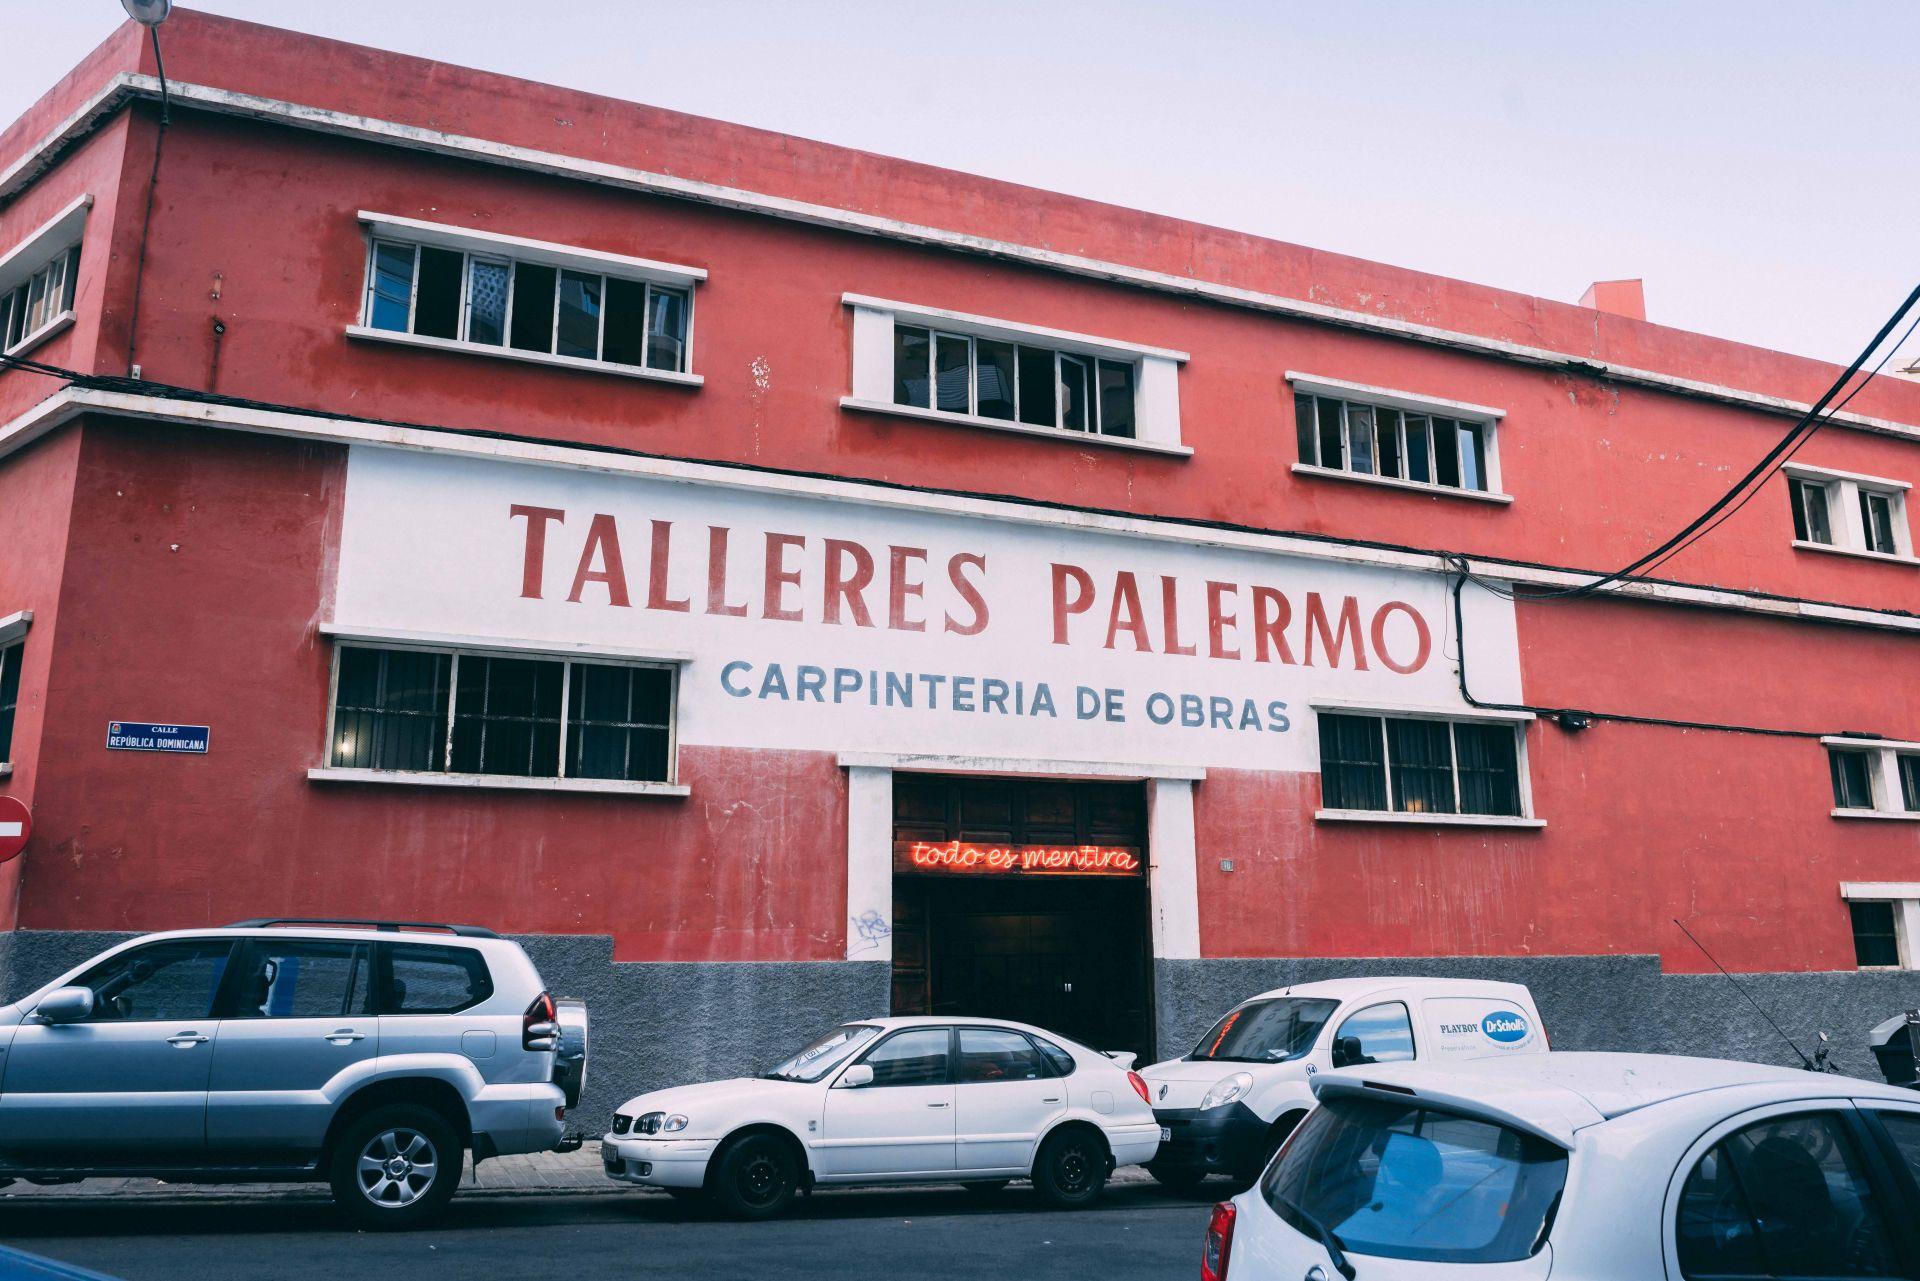 TALLERES PALERMO, Las Palmas